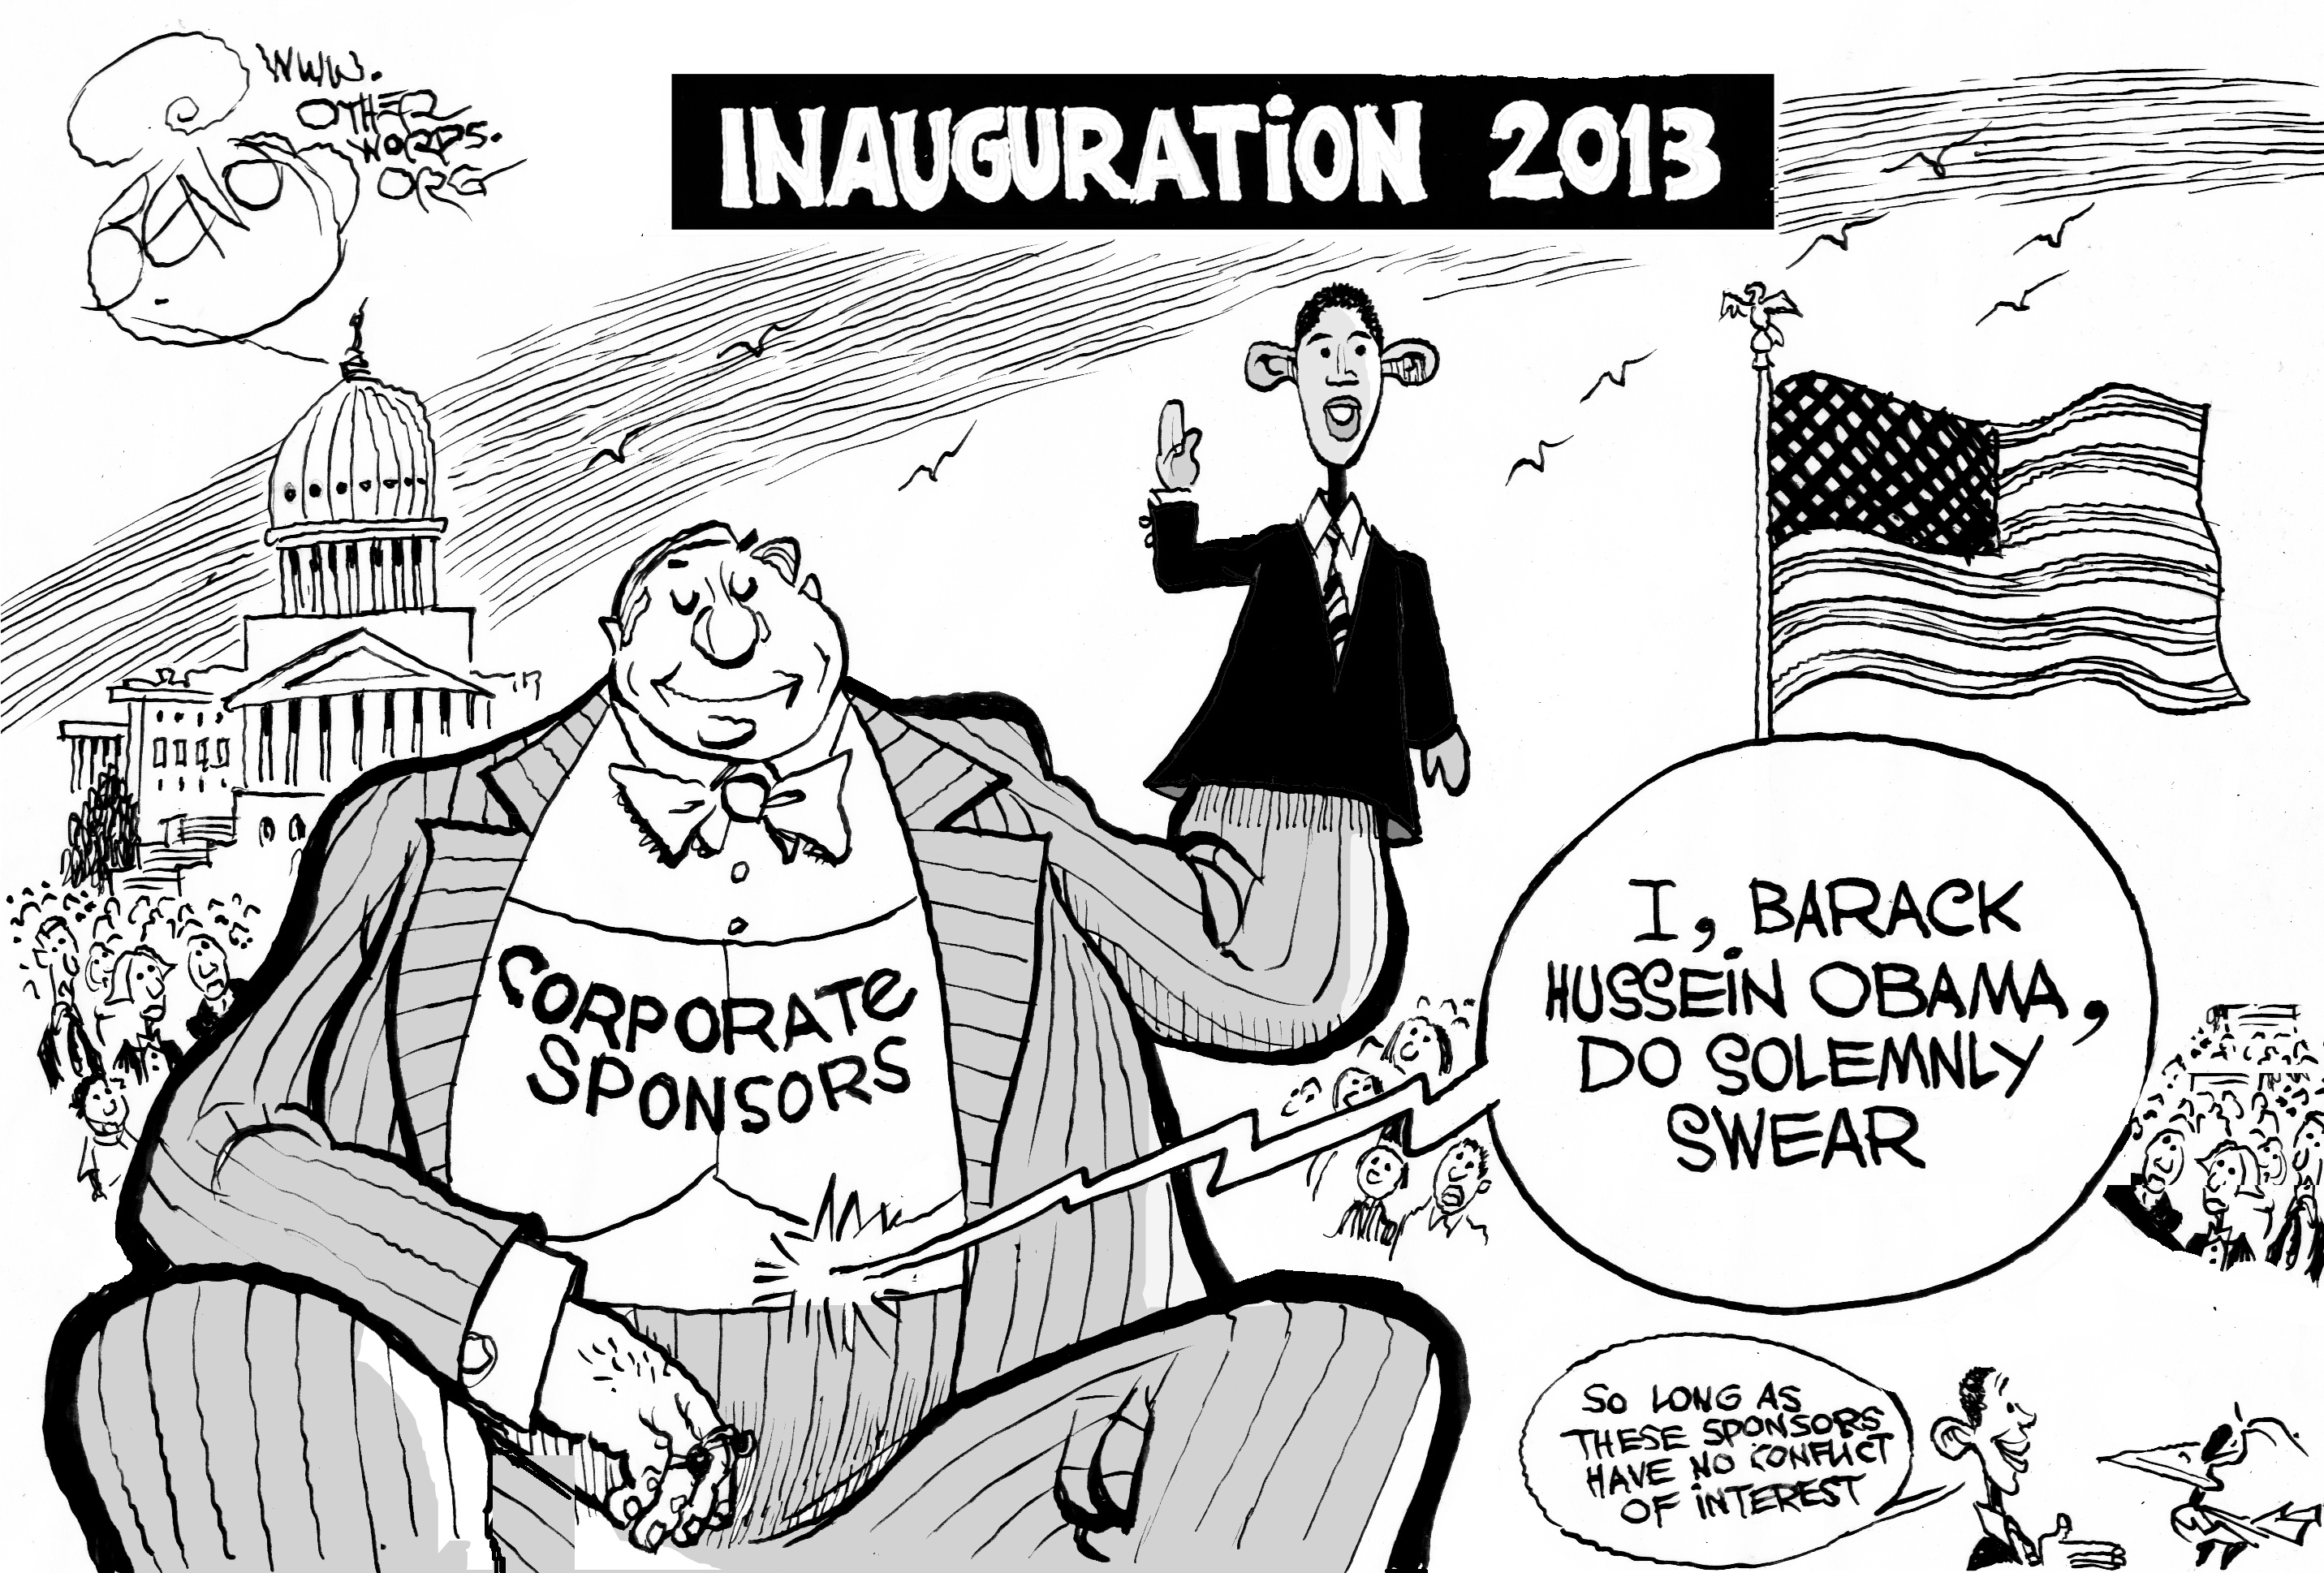 Corporate-Sponsored Inauguration